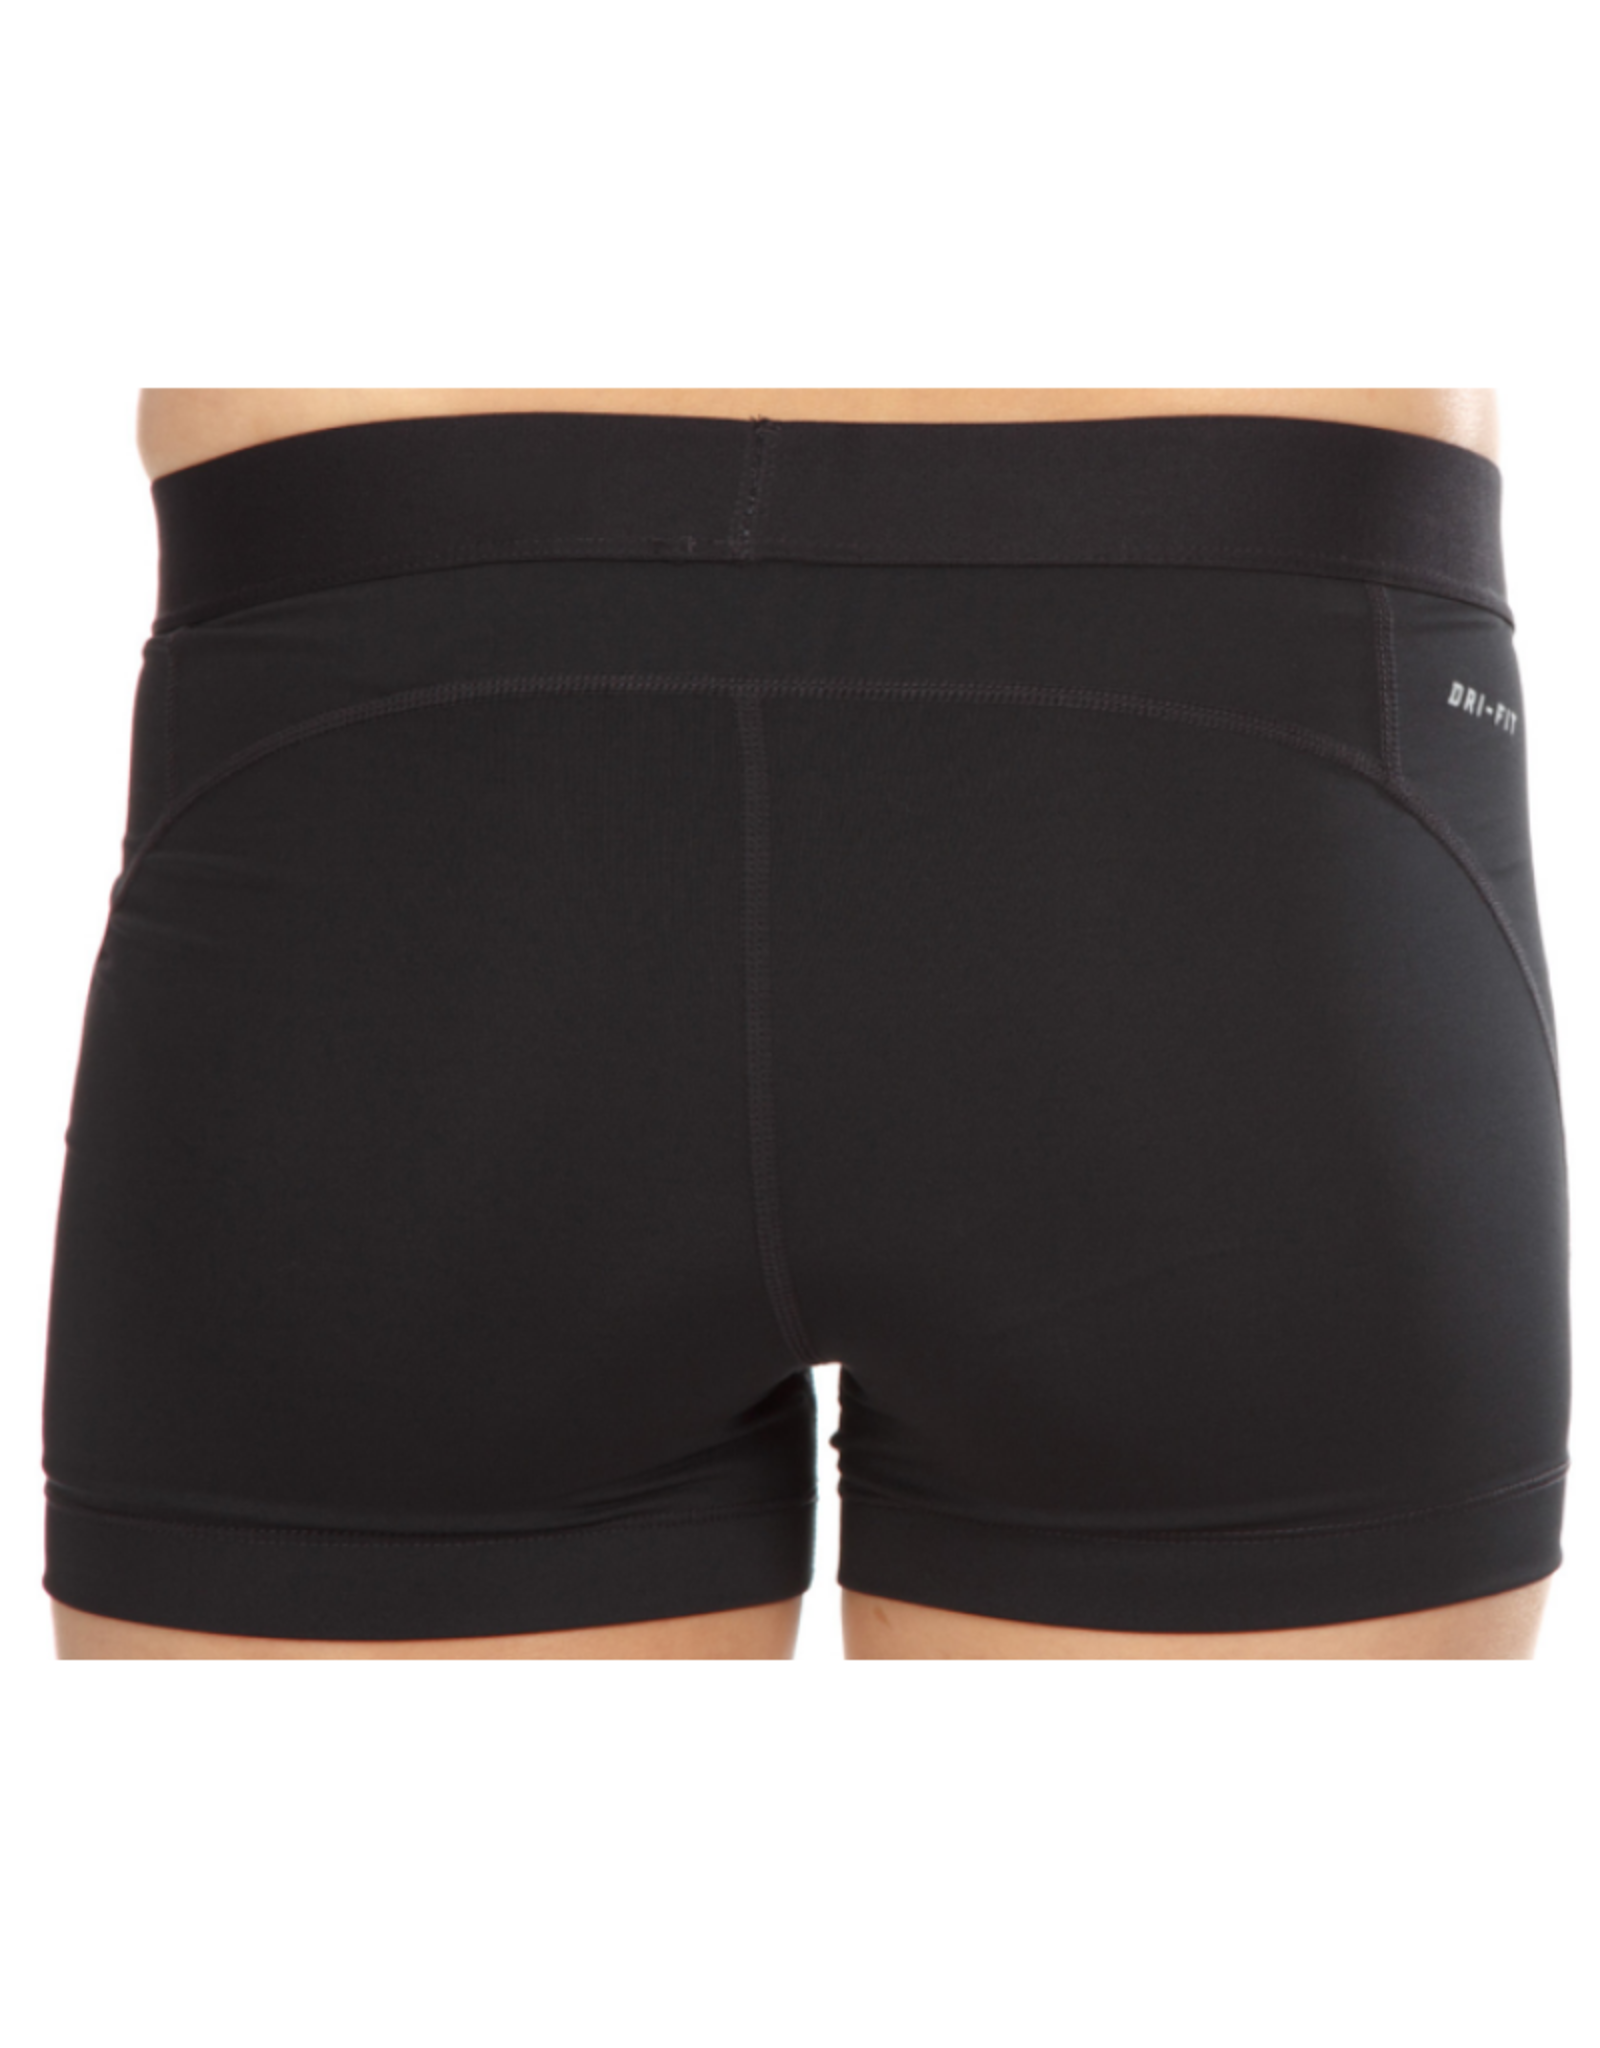 "Nike Women's Pro Volleyball Short 3"" Black"